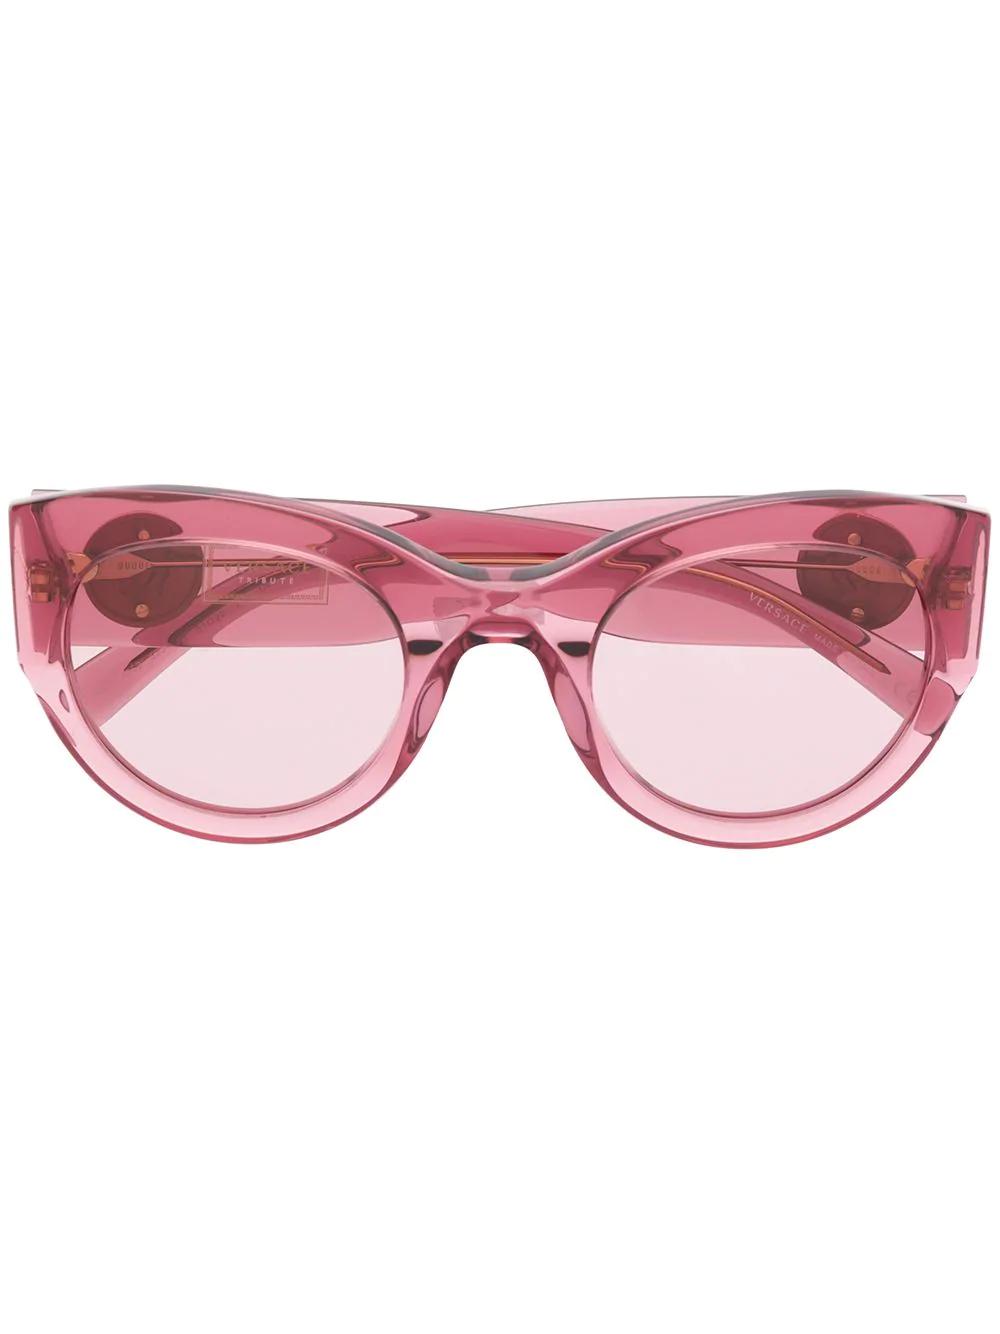 a9a6e53535c Versace Eyewear Oval Sunglasses - Pink